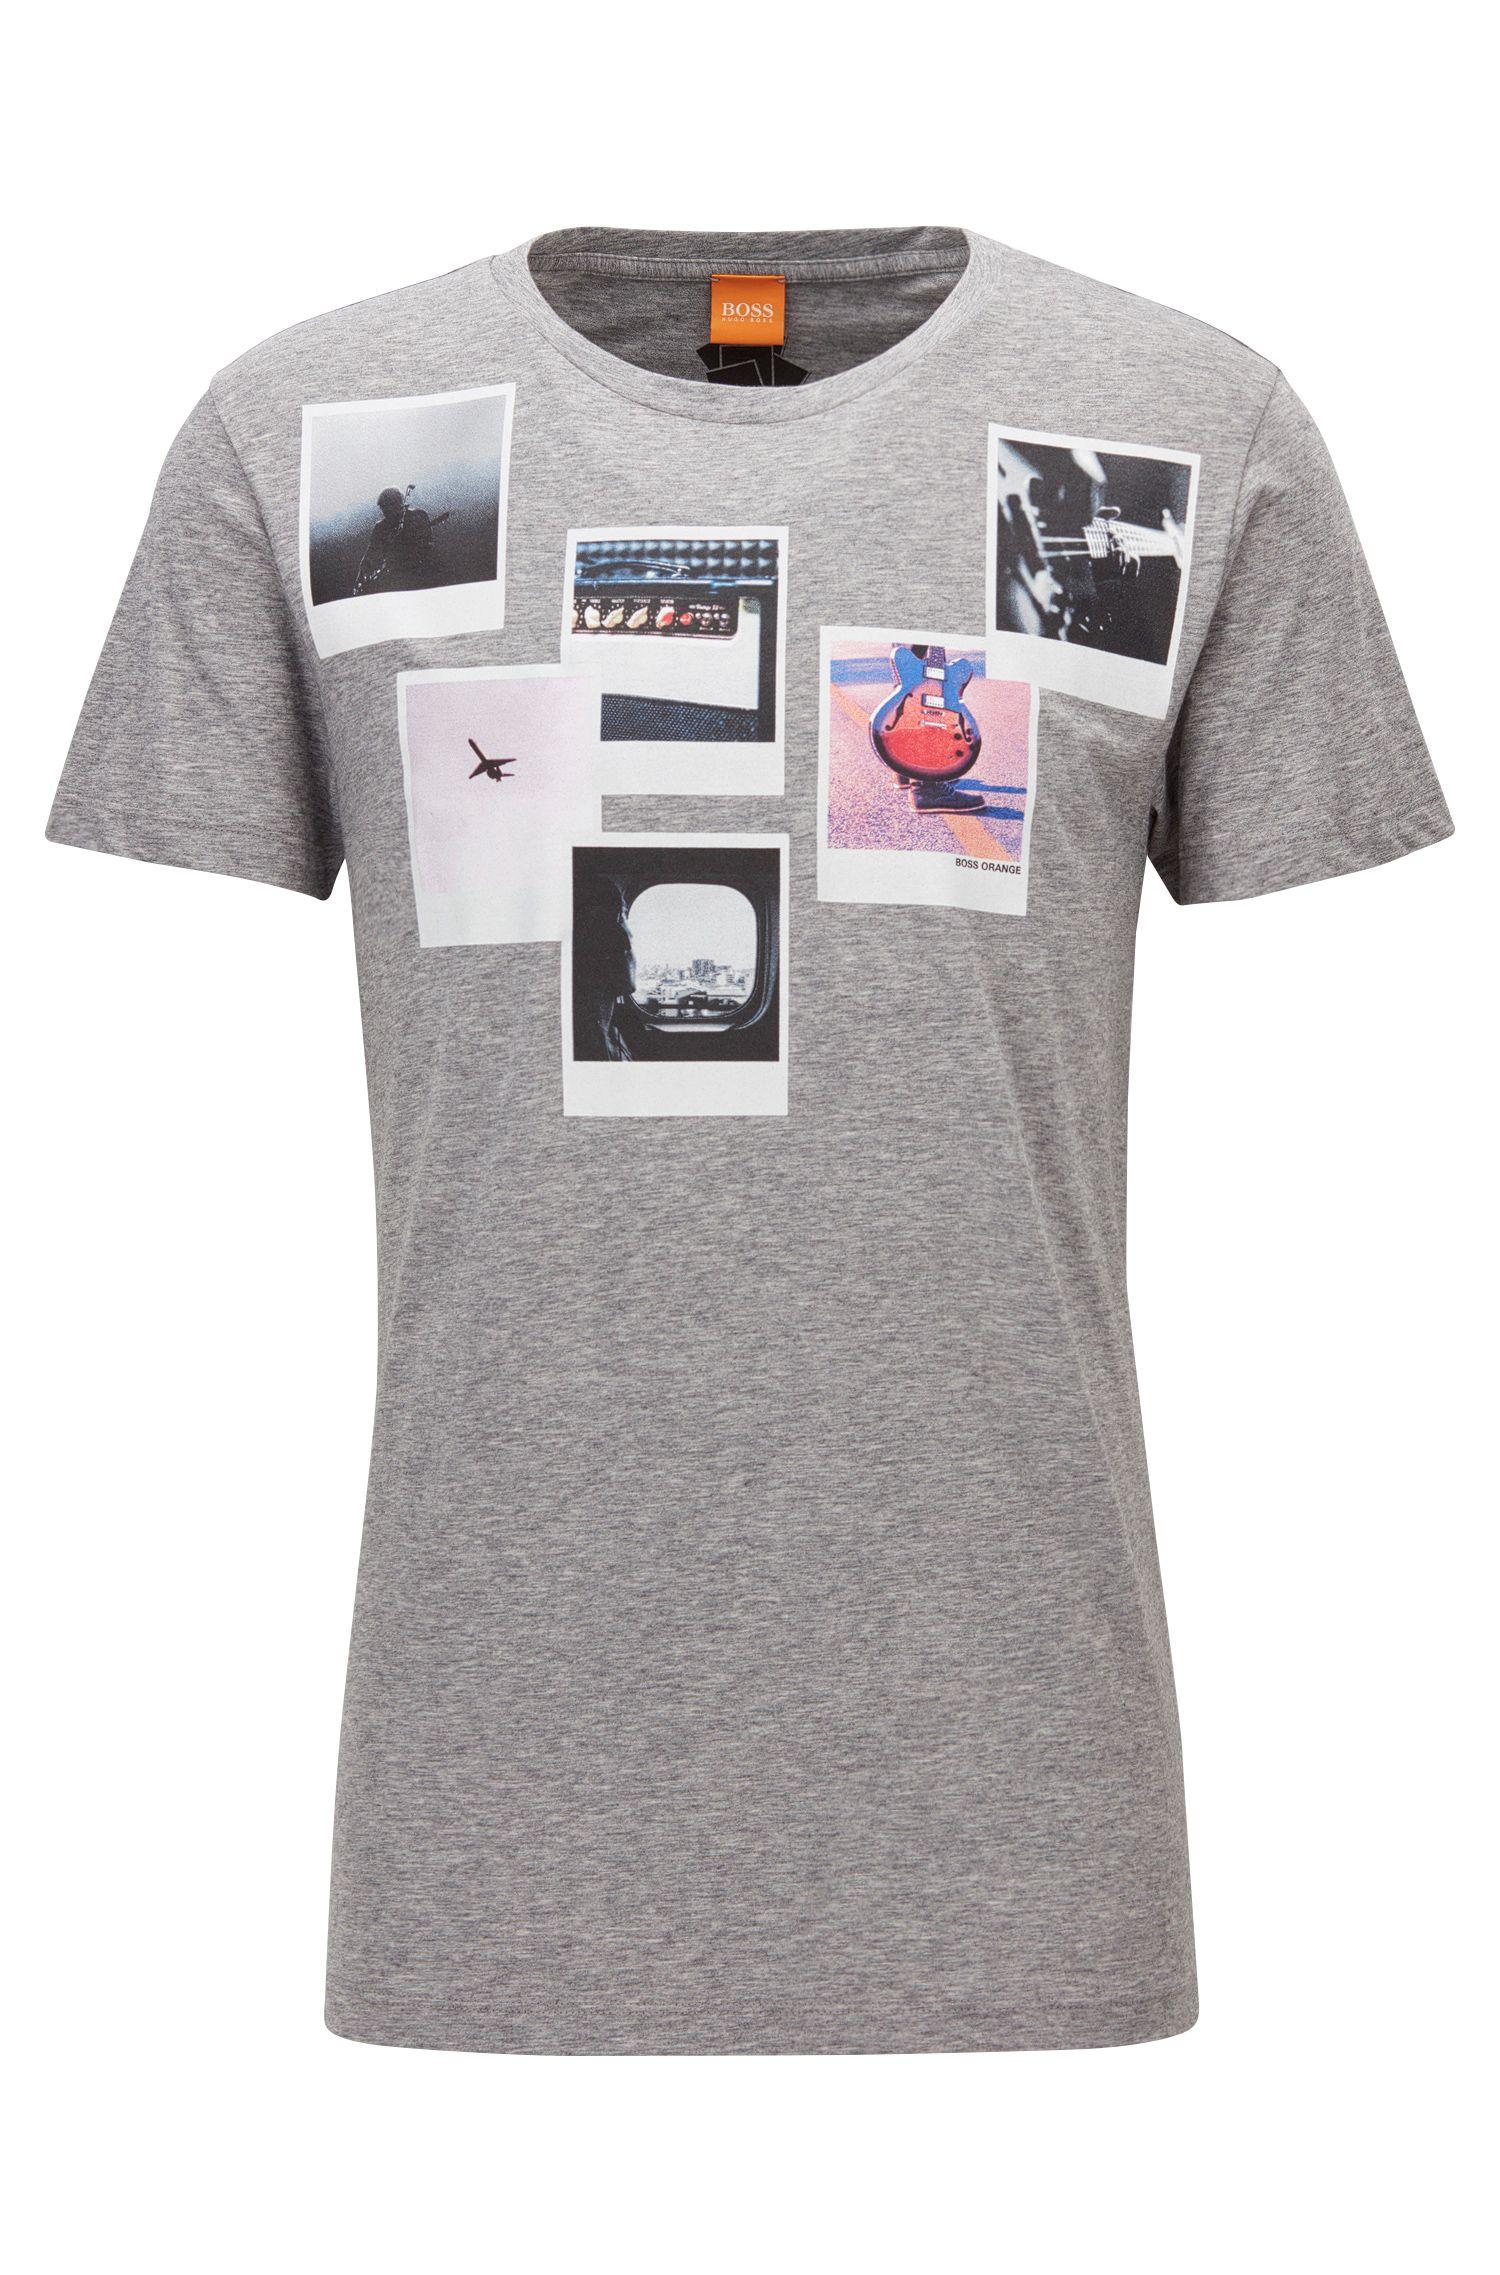 Pima Cotton Graphic T-Shirt | Taxable